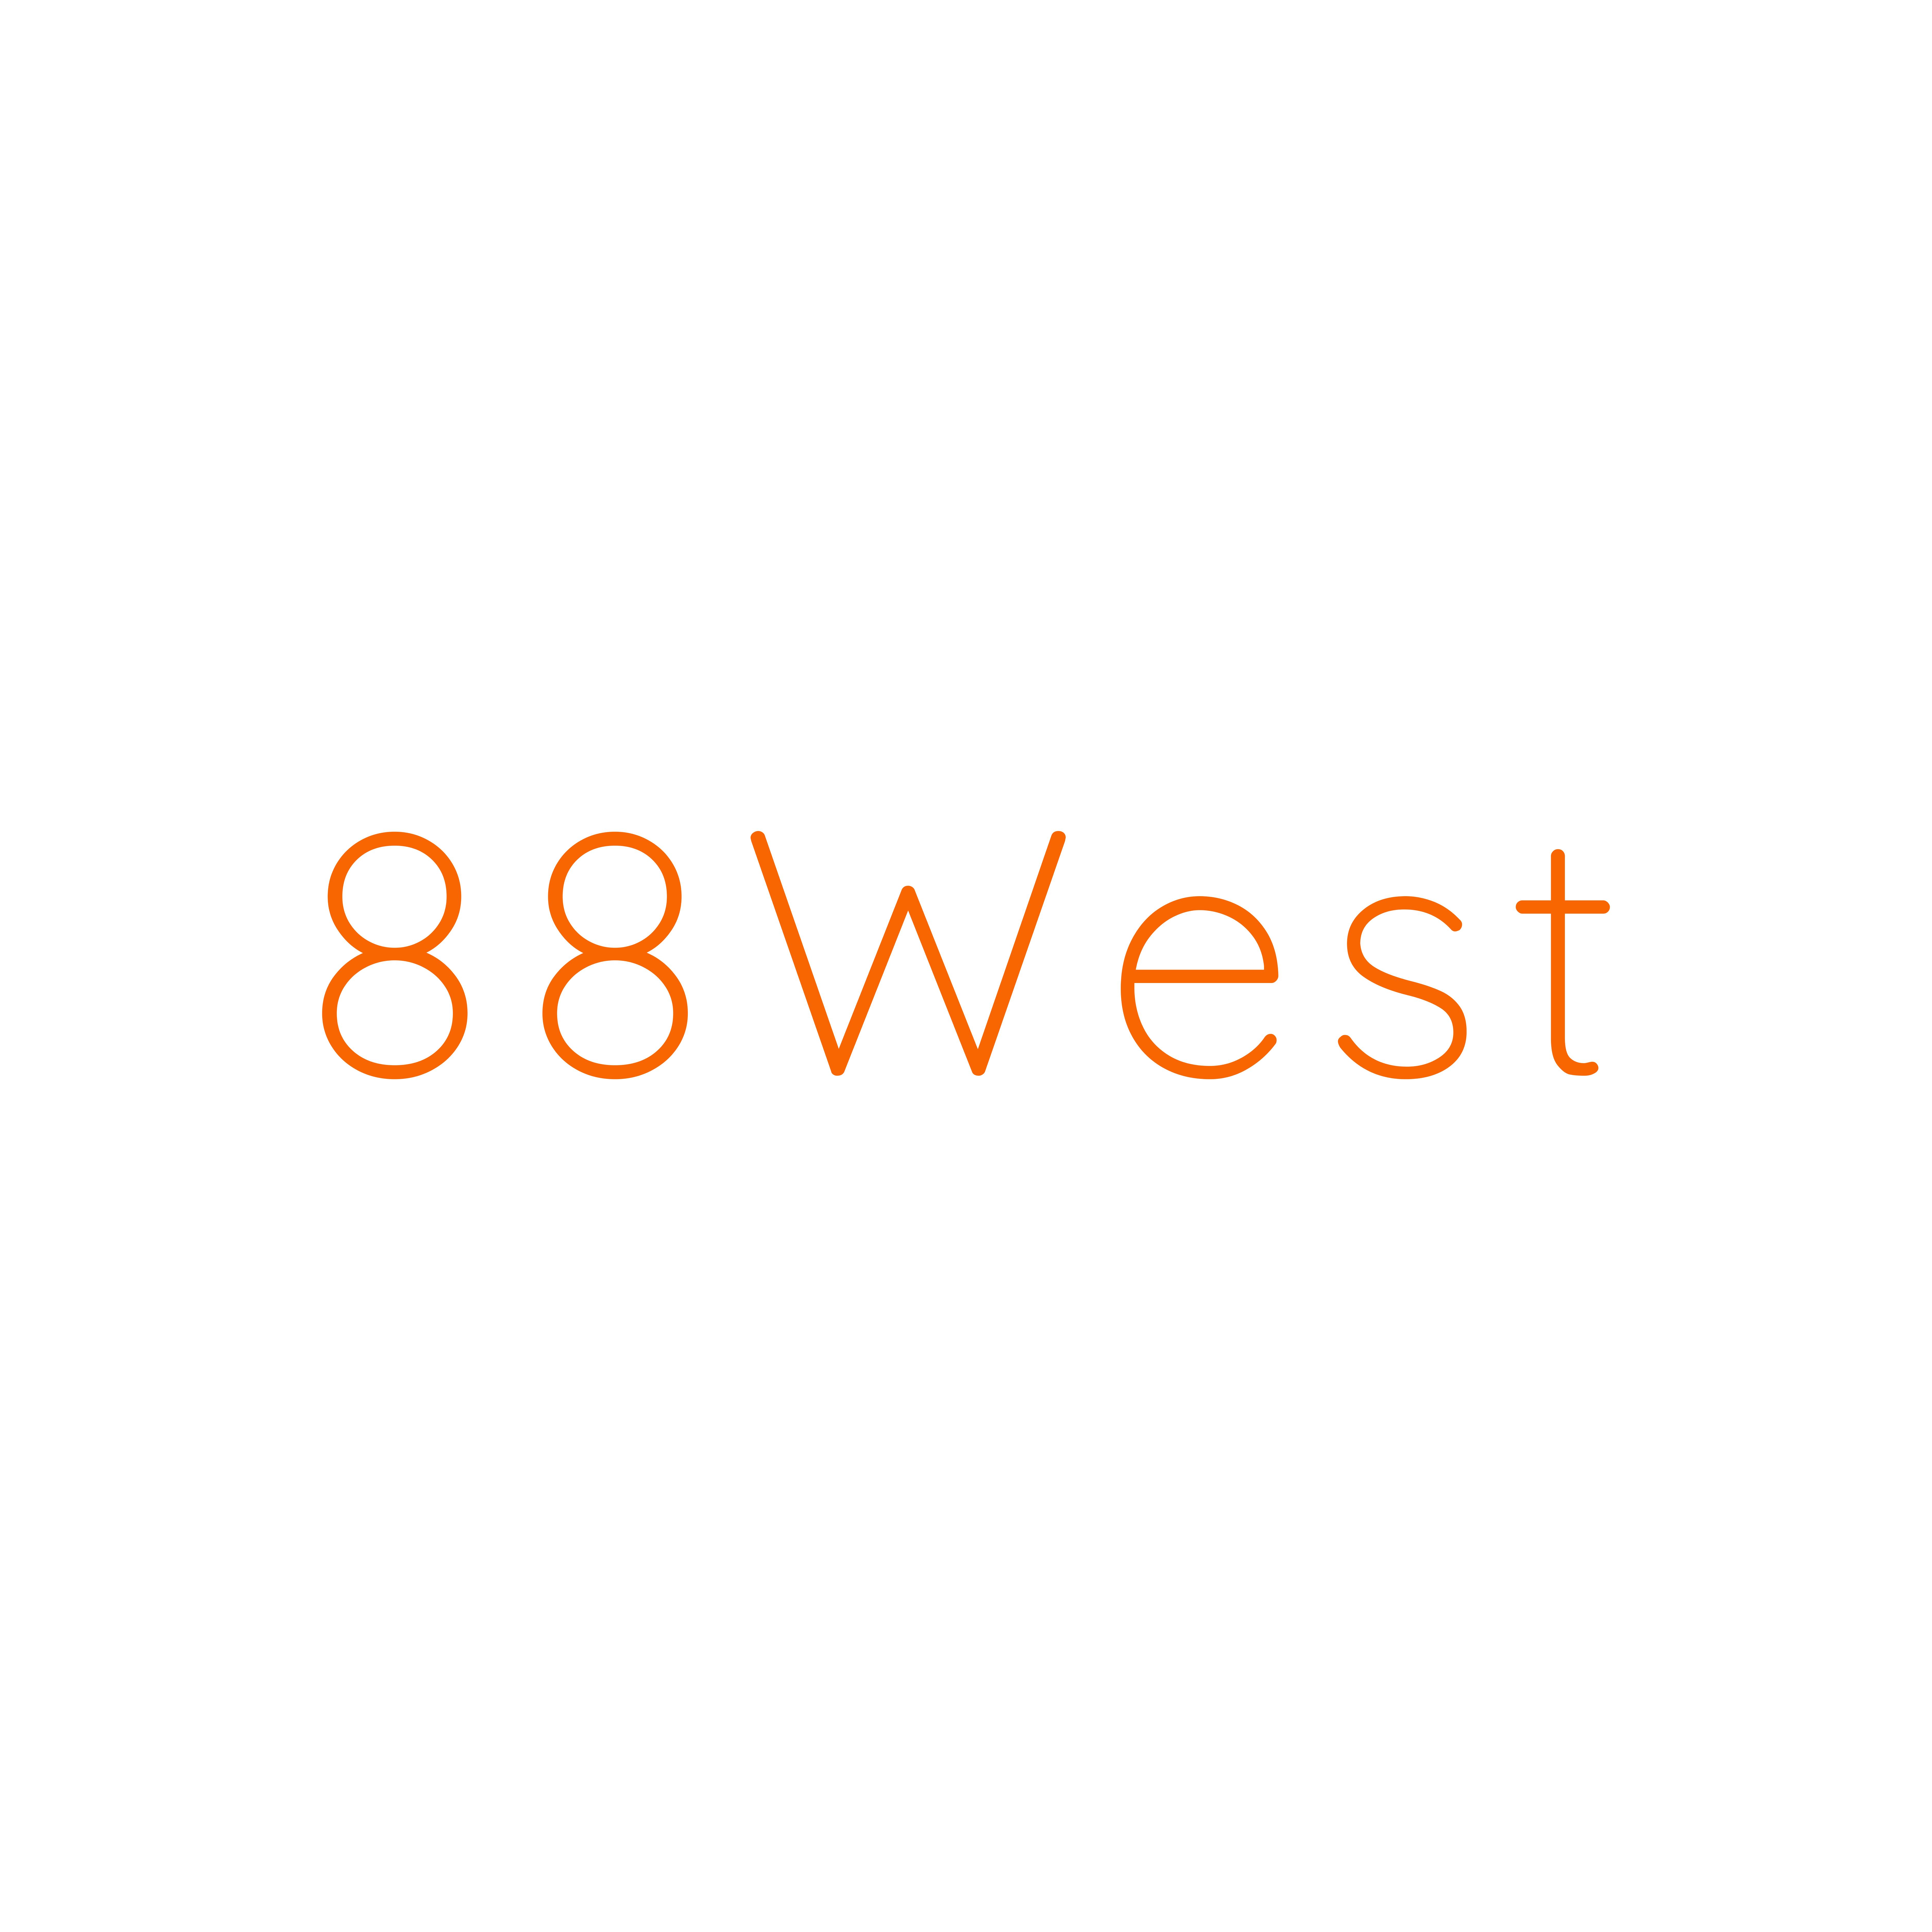 88 West Apartments